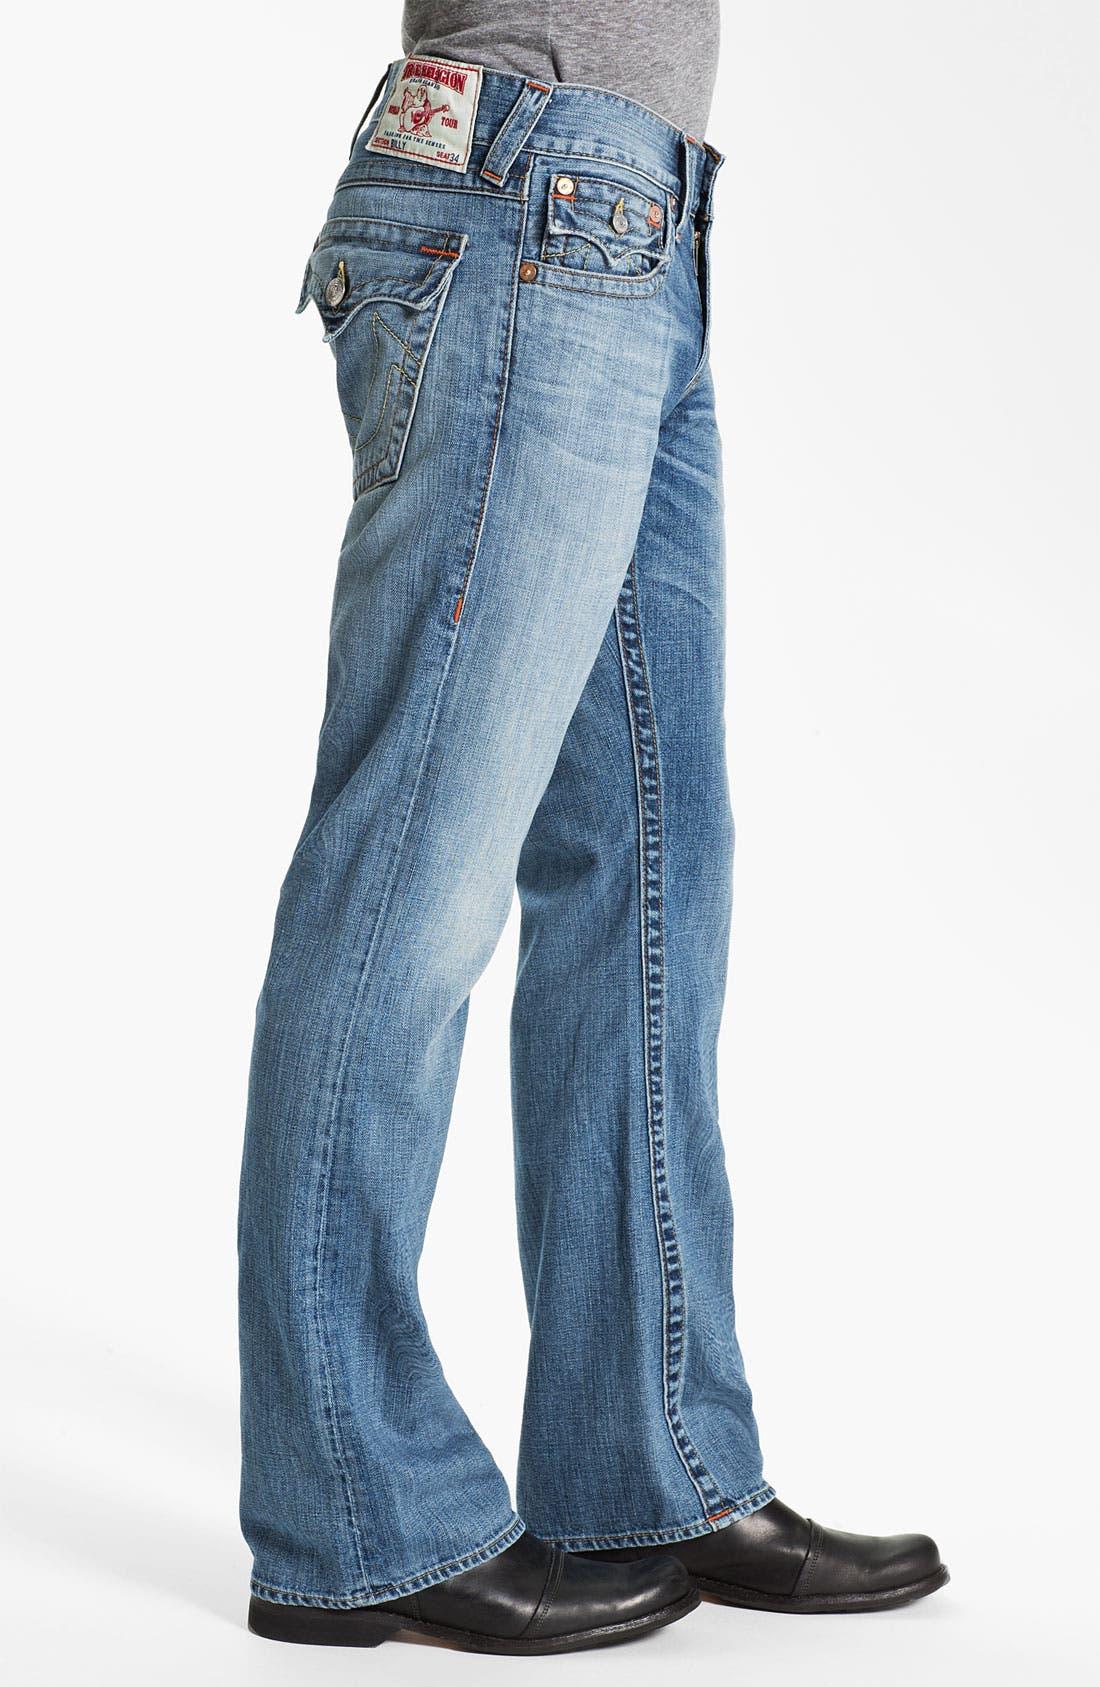 Alternate Image 3  - True Religion Brand Jeans 'Billy' Bootcut Jeans (Vam Shade Horizon)